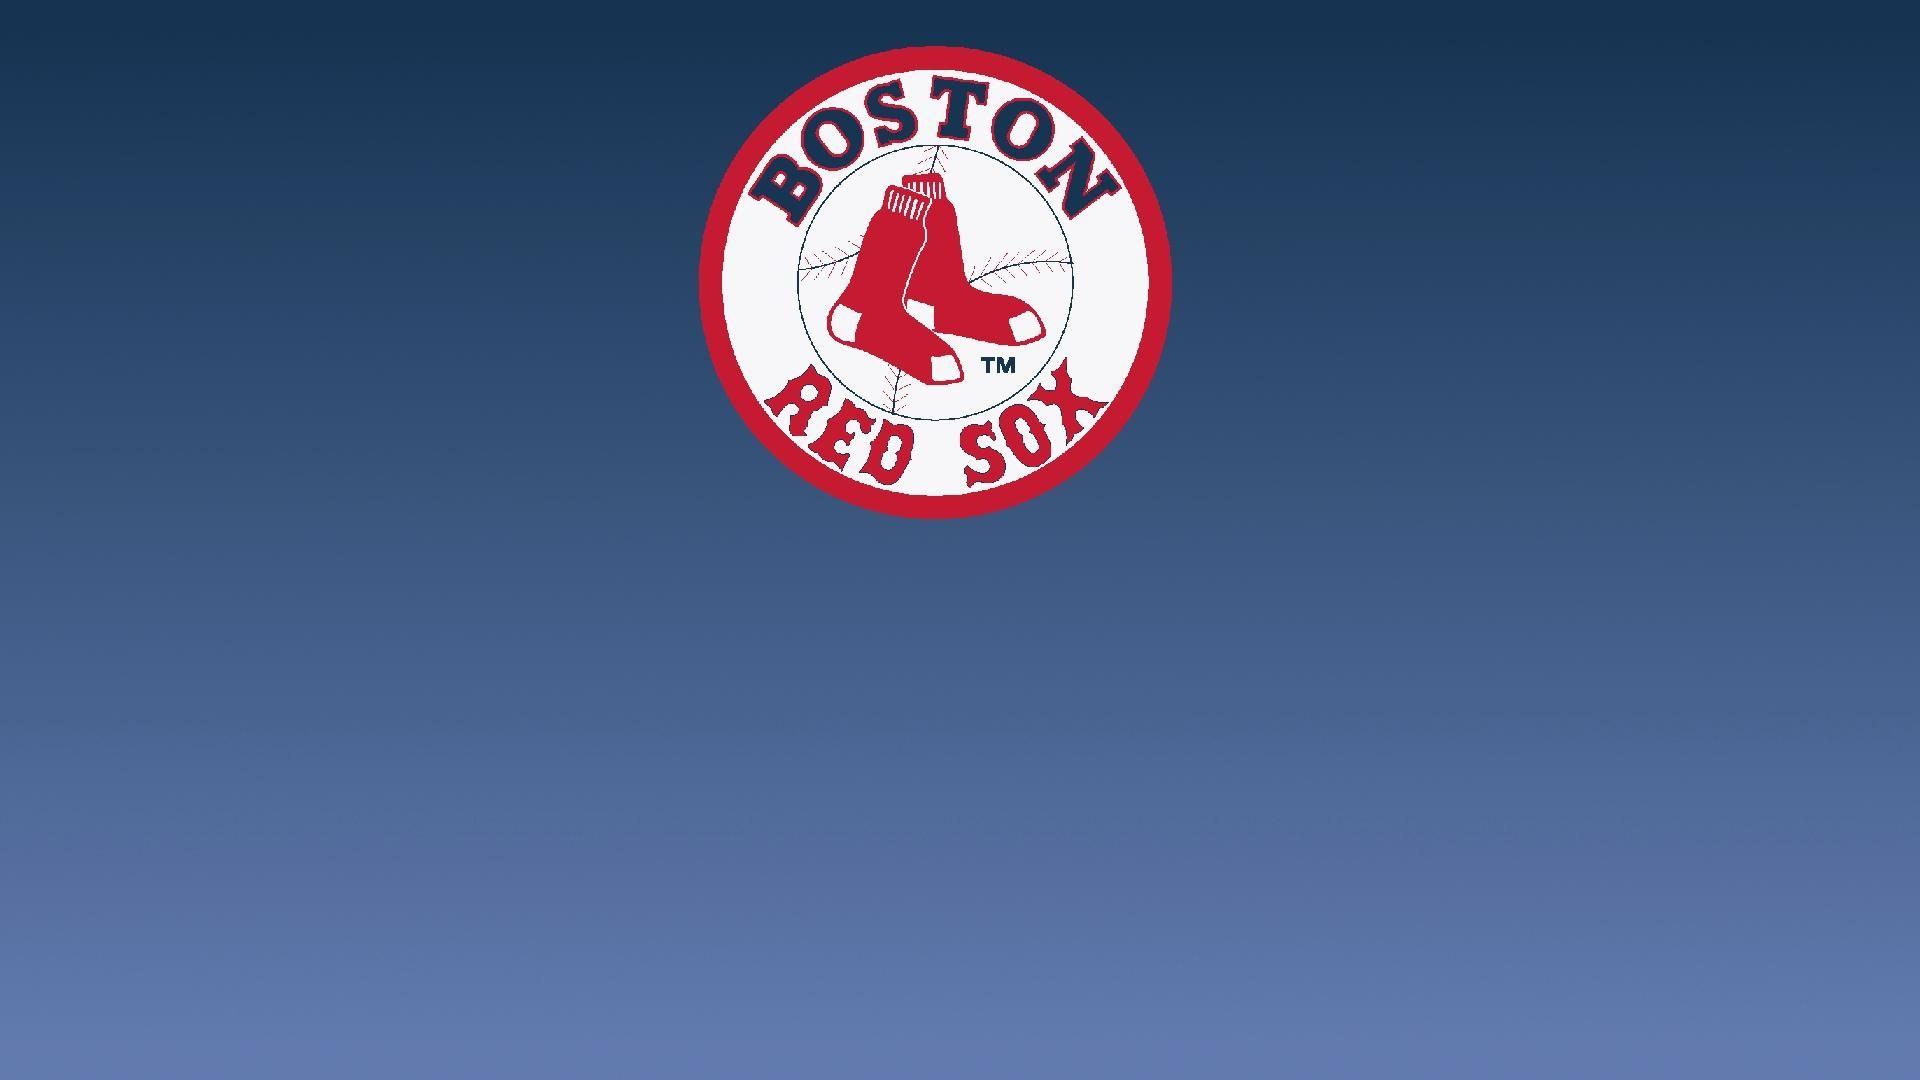 wallpaper.wiki-HD-Boston-Red-Sox-Logo-Backgrounds-